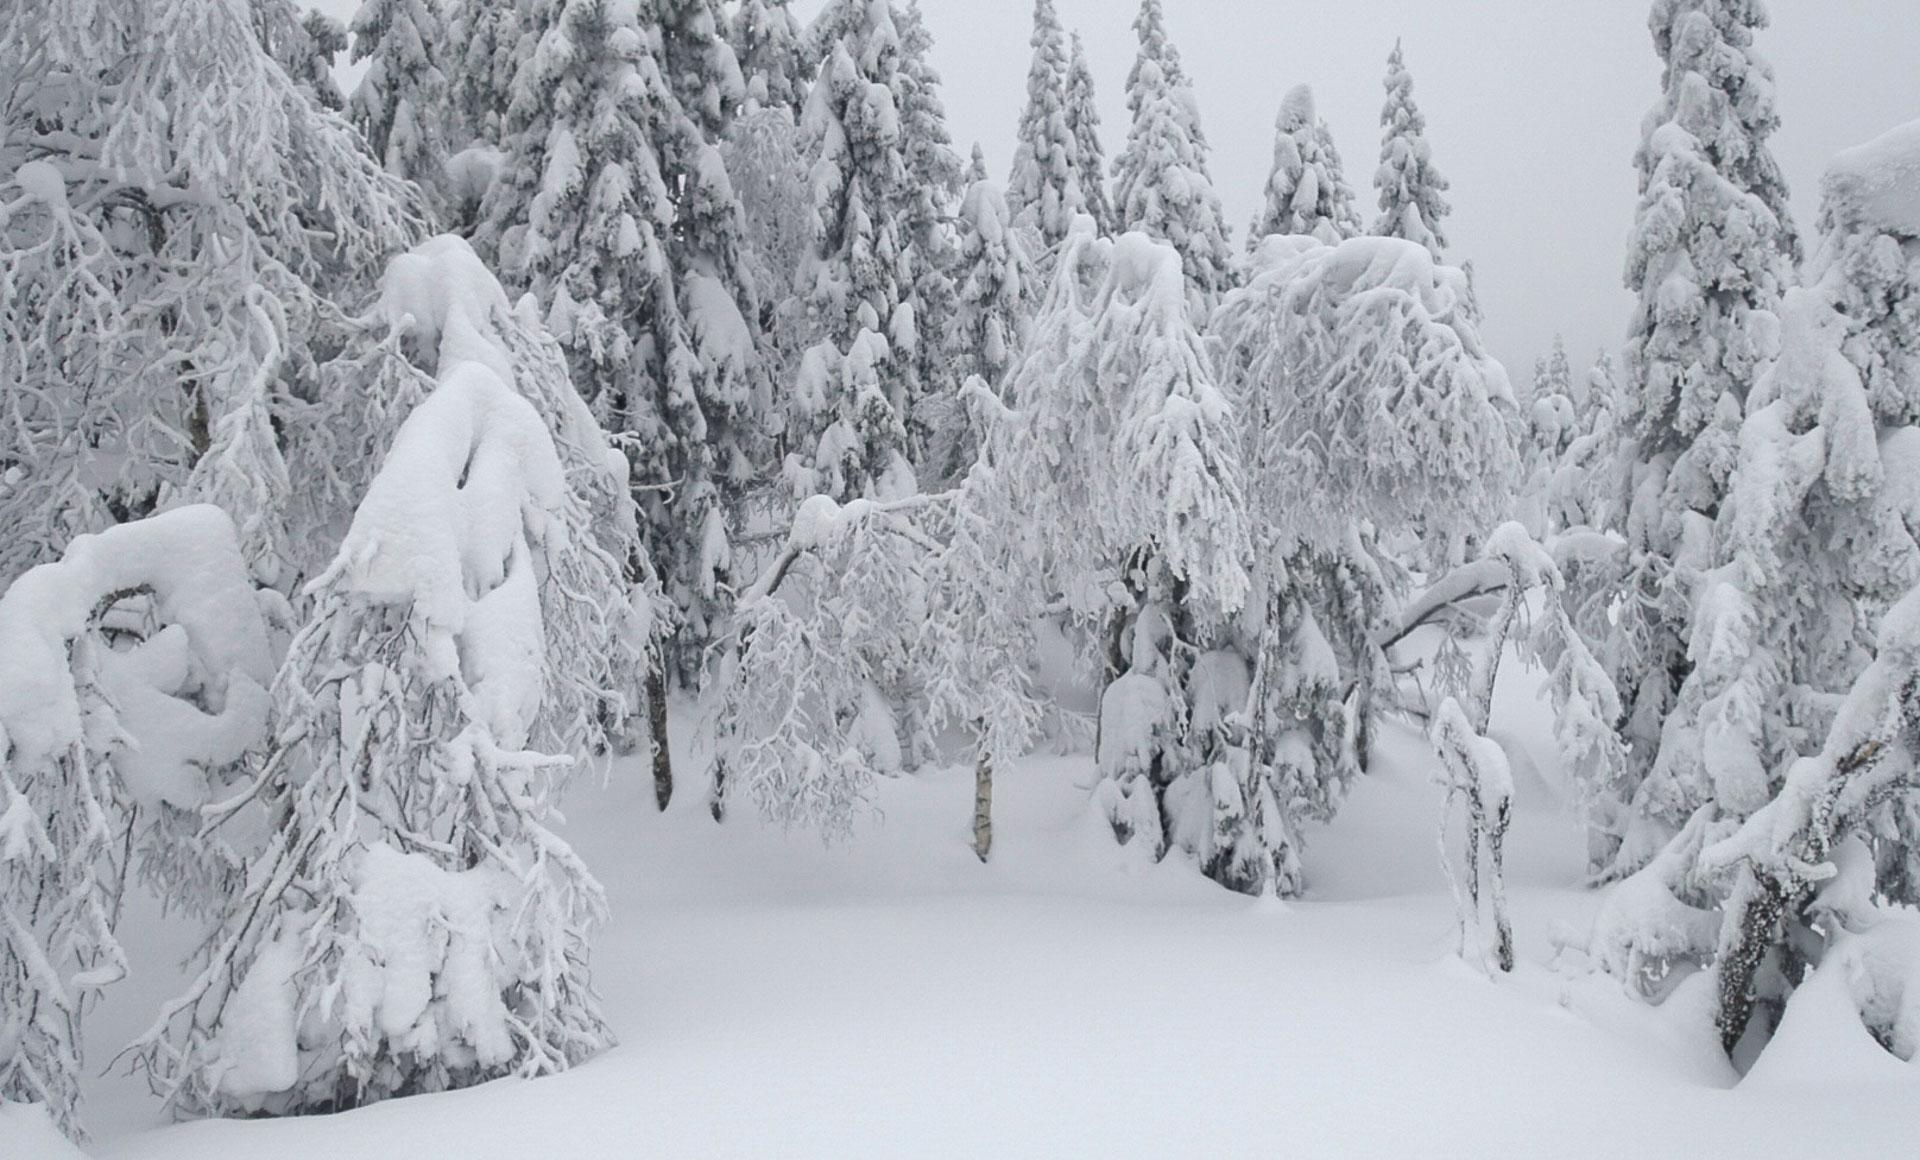 Er dette trær eller noe annet levende? Foto: Bjørnar Eidsmo.